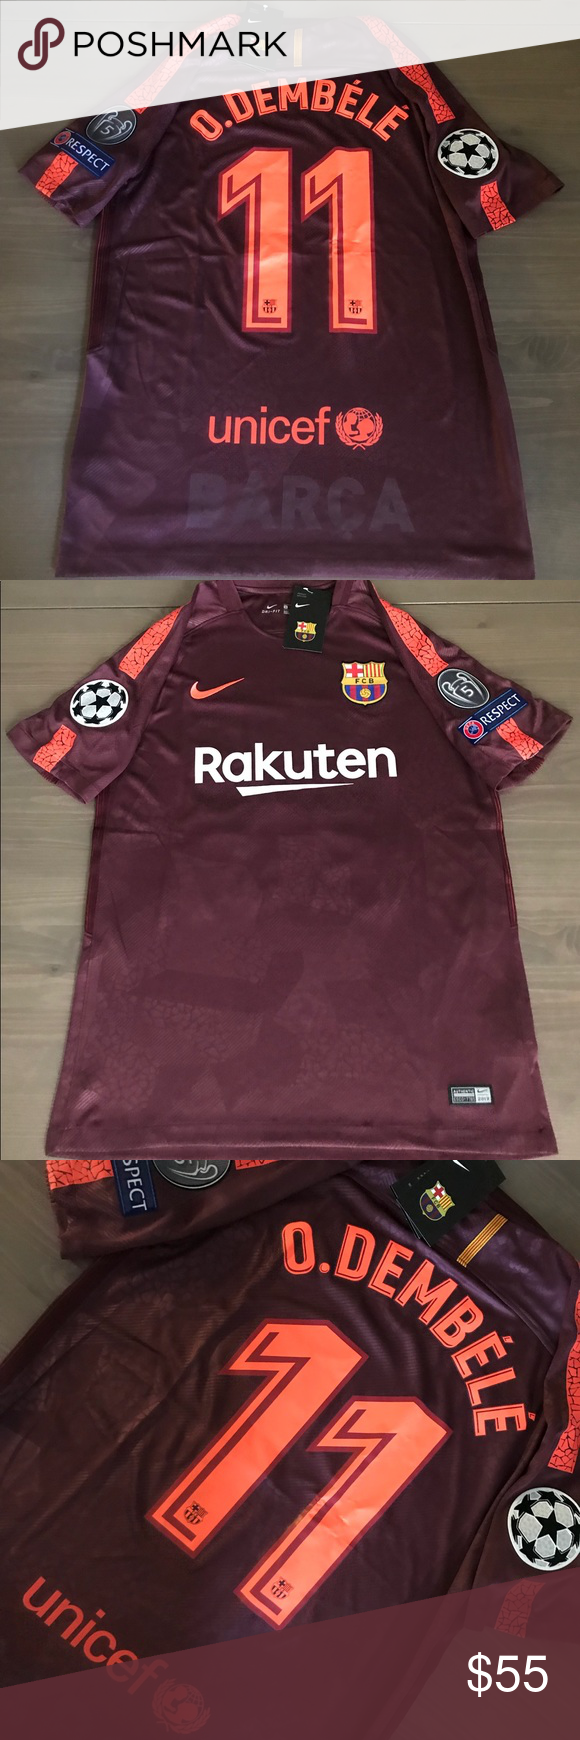 aff487ddcff Barcelona O. Dembélé #11 burgundy soccer Jersey Barcelona O. Dembélé #11  away burgundy 17/18 soccer jersey champions league men Size: Medium Nike  Shirts ...